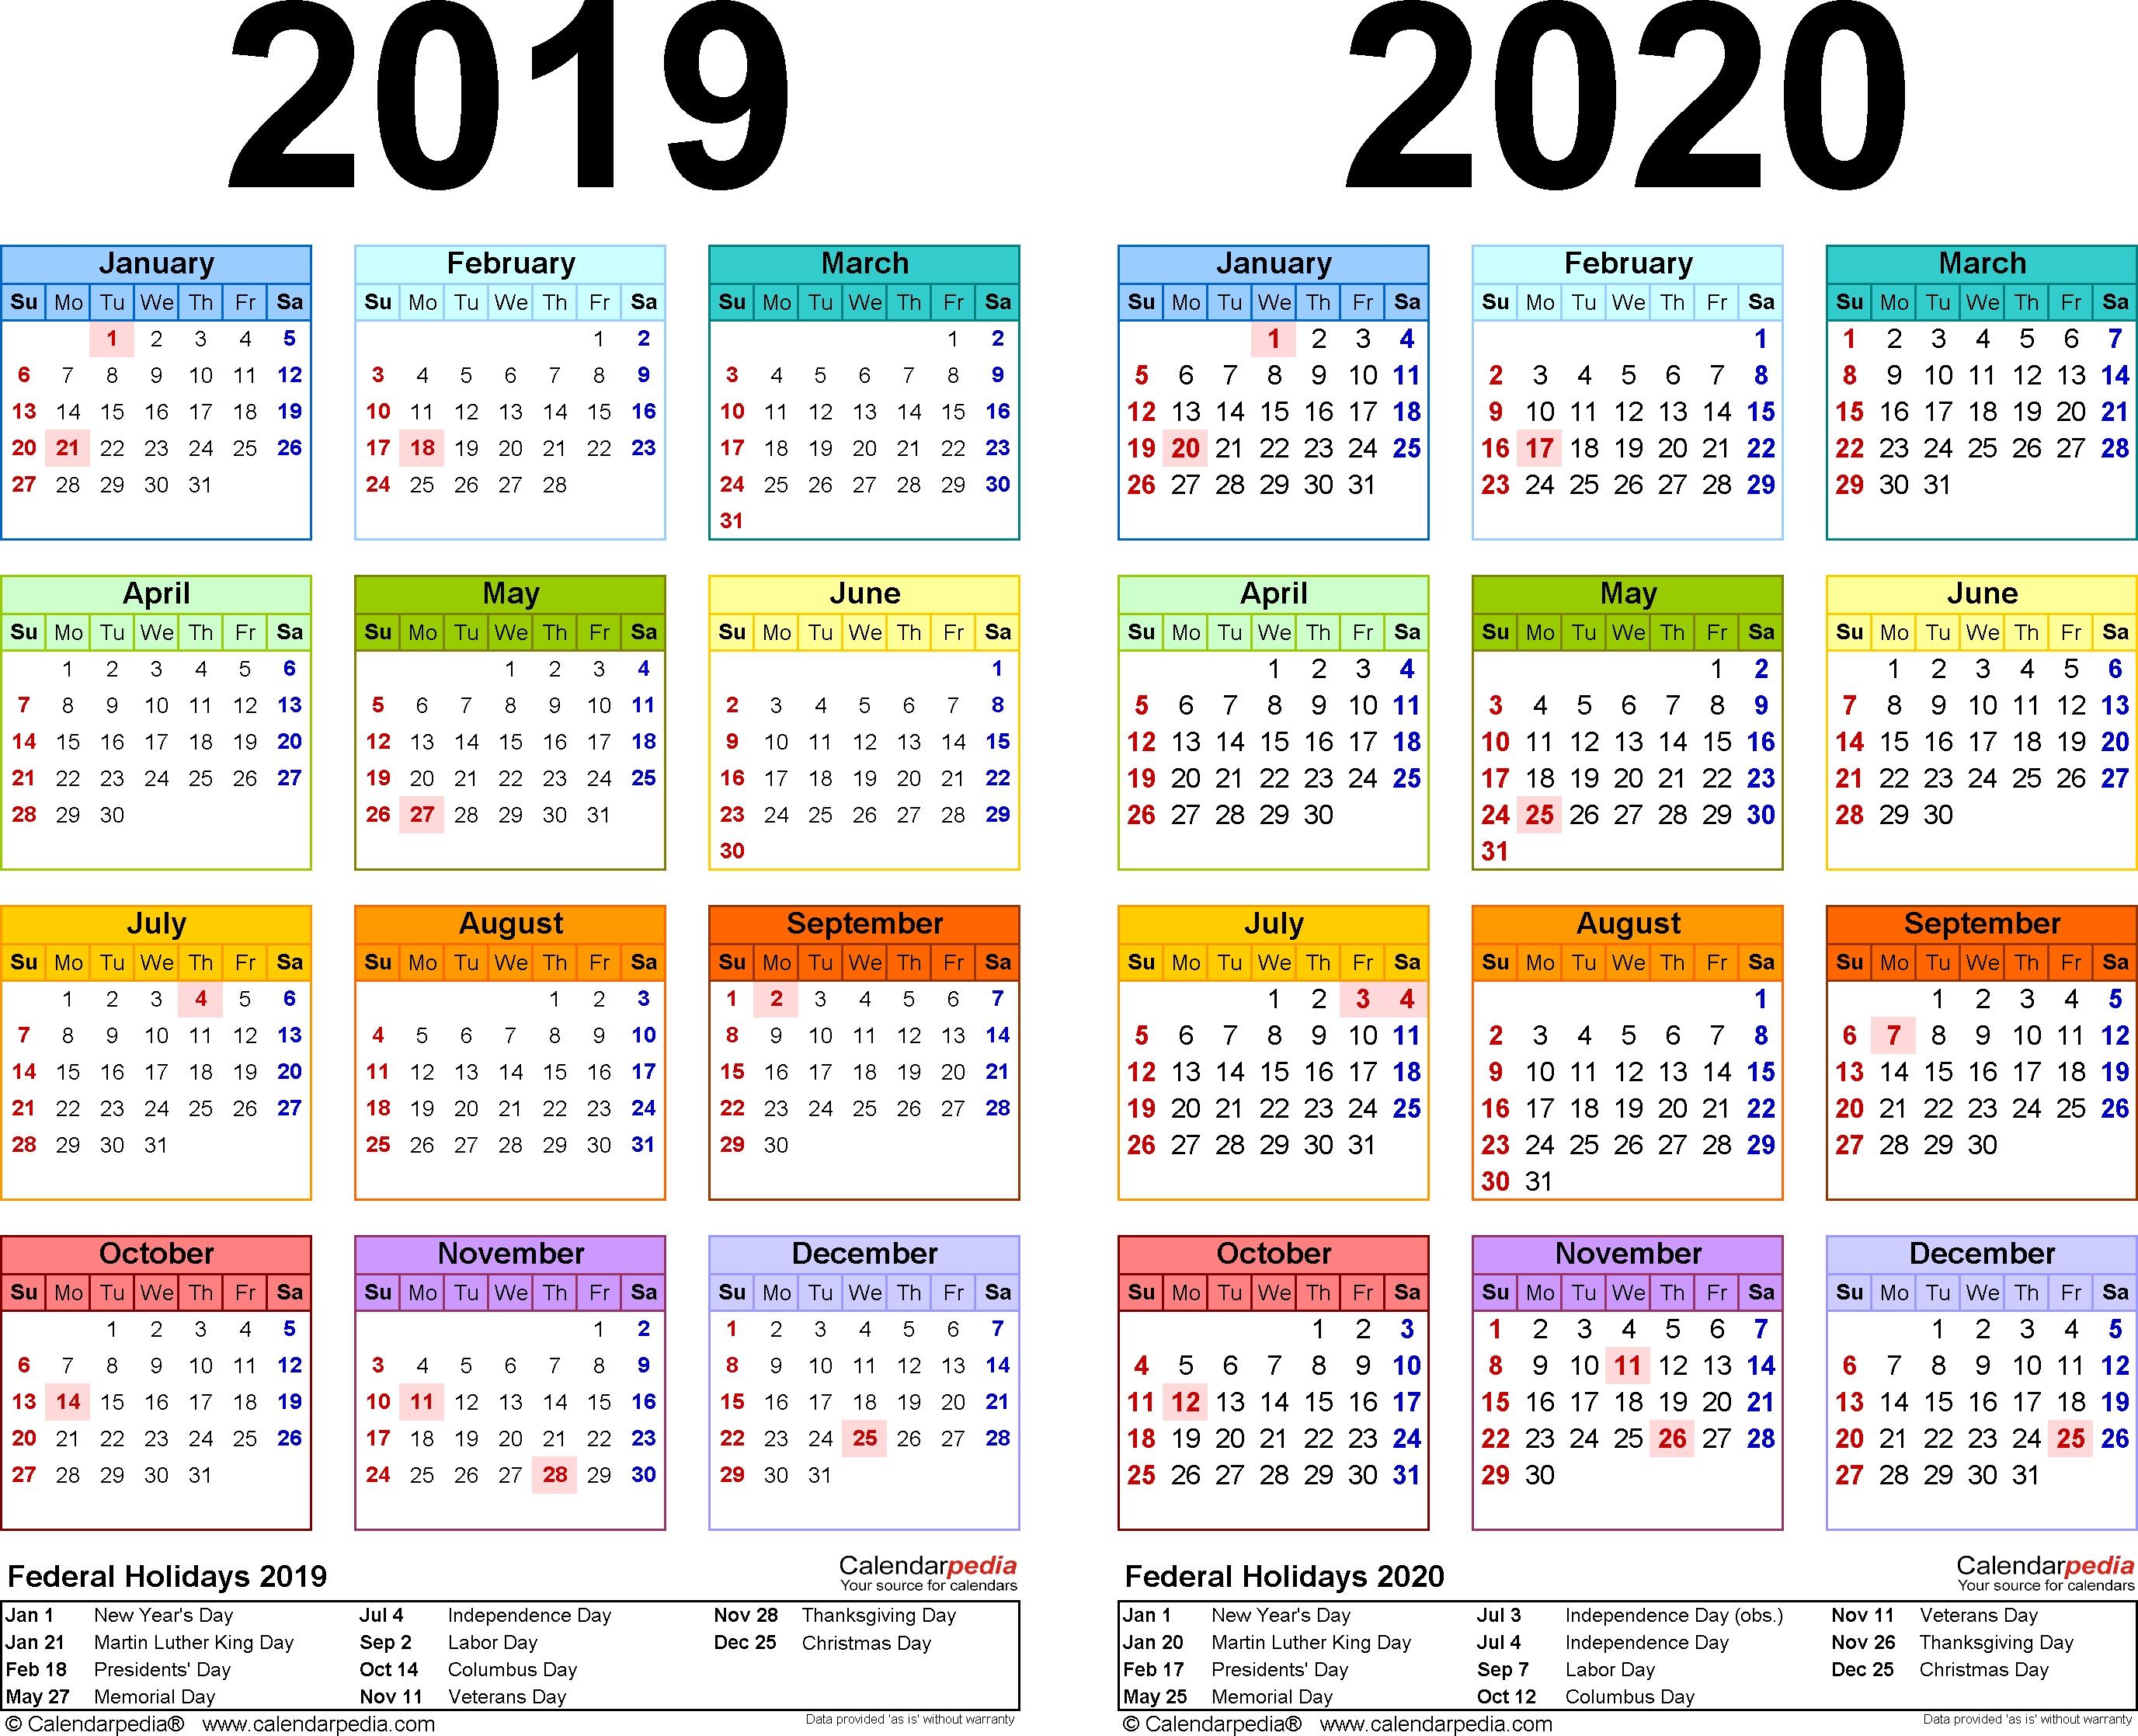 2019-2020 Calendar - Free Printable Two-Year Pdf Calendars in Tax Week Calendar 2019 2020